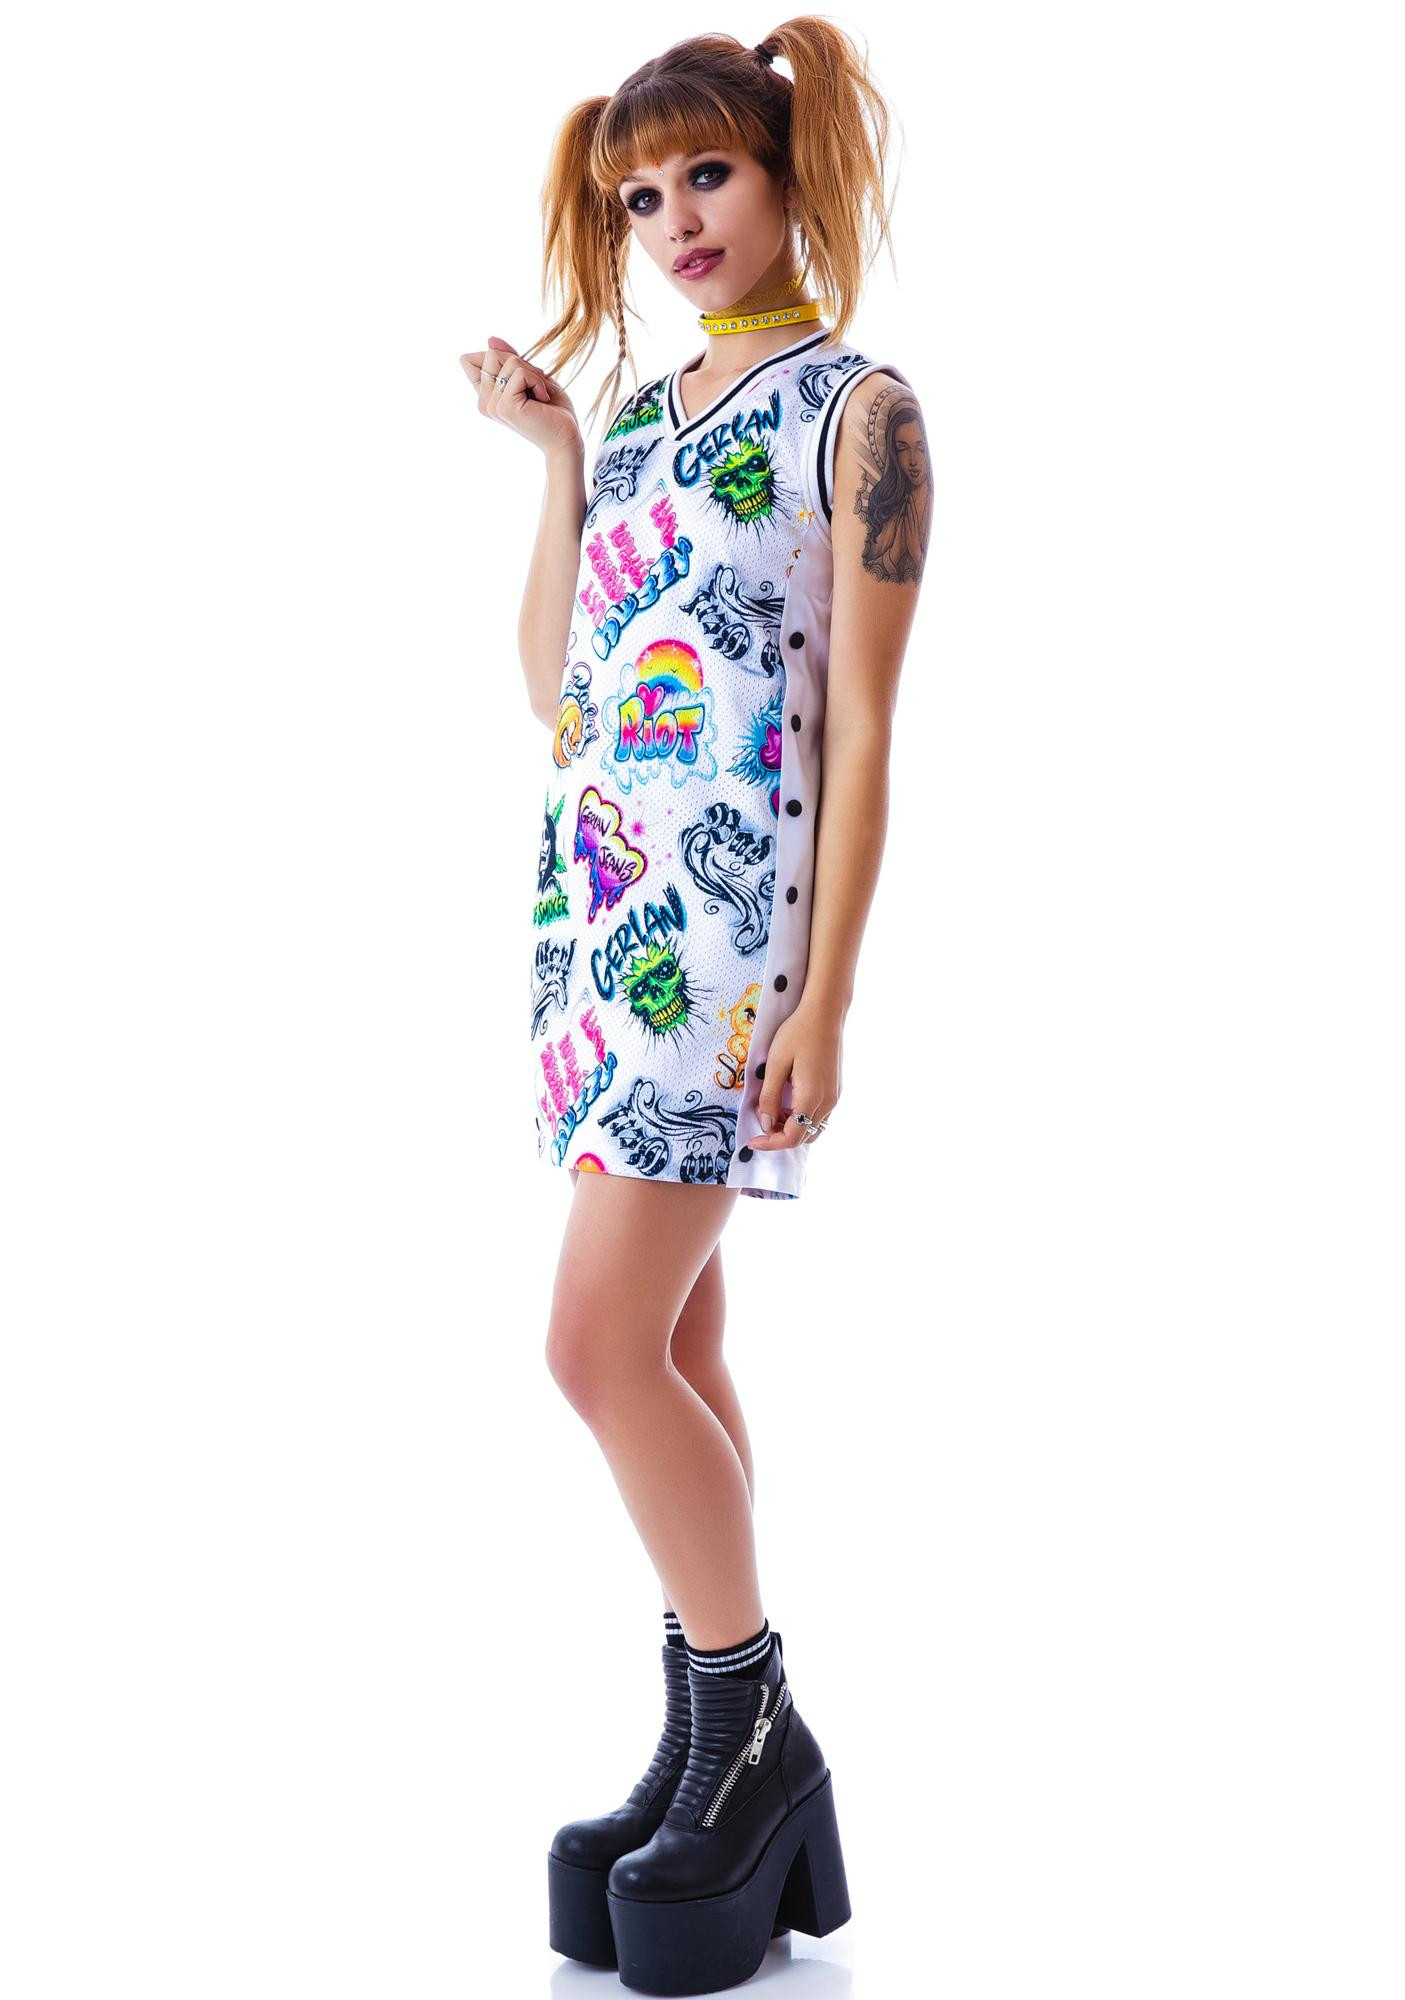 Gerlan Jeans Gerl Unit B-Ball Dress